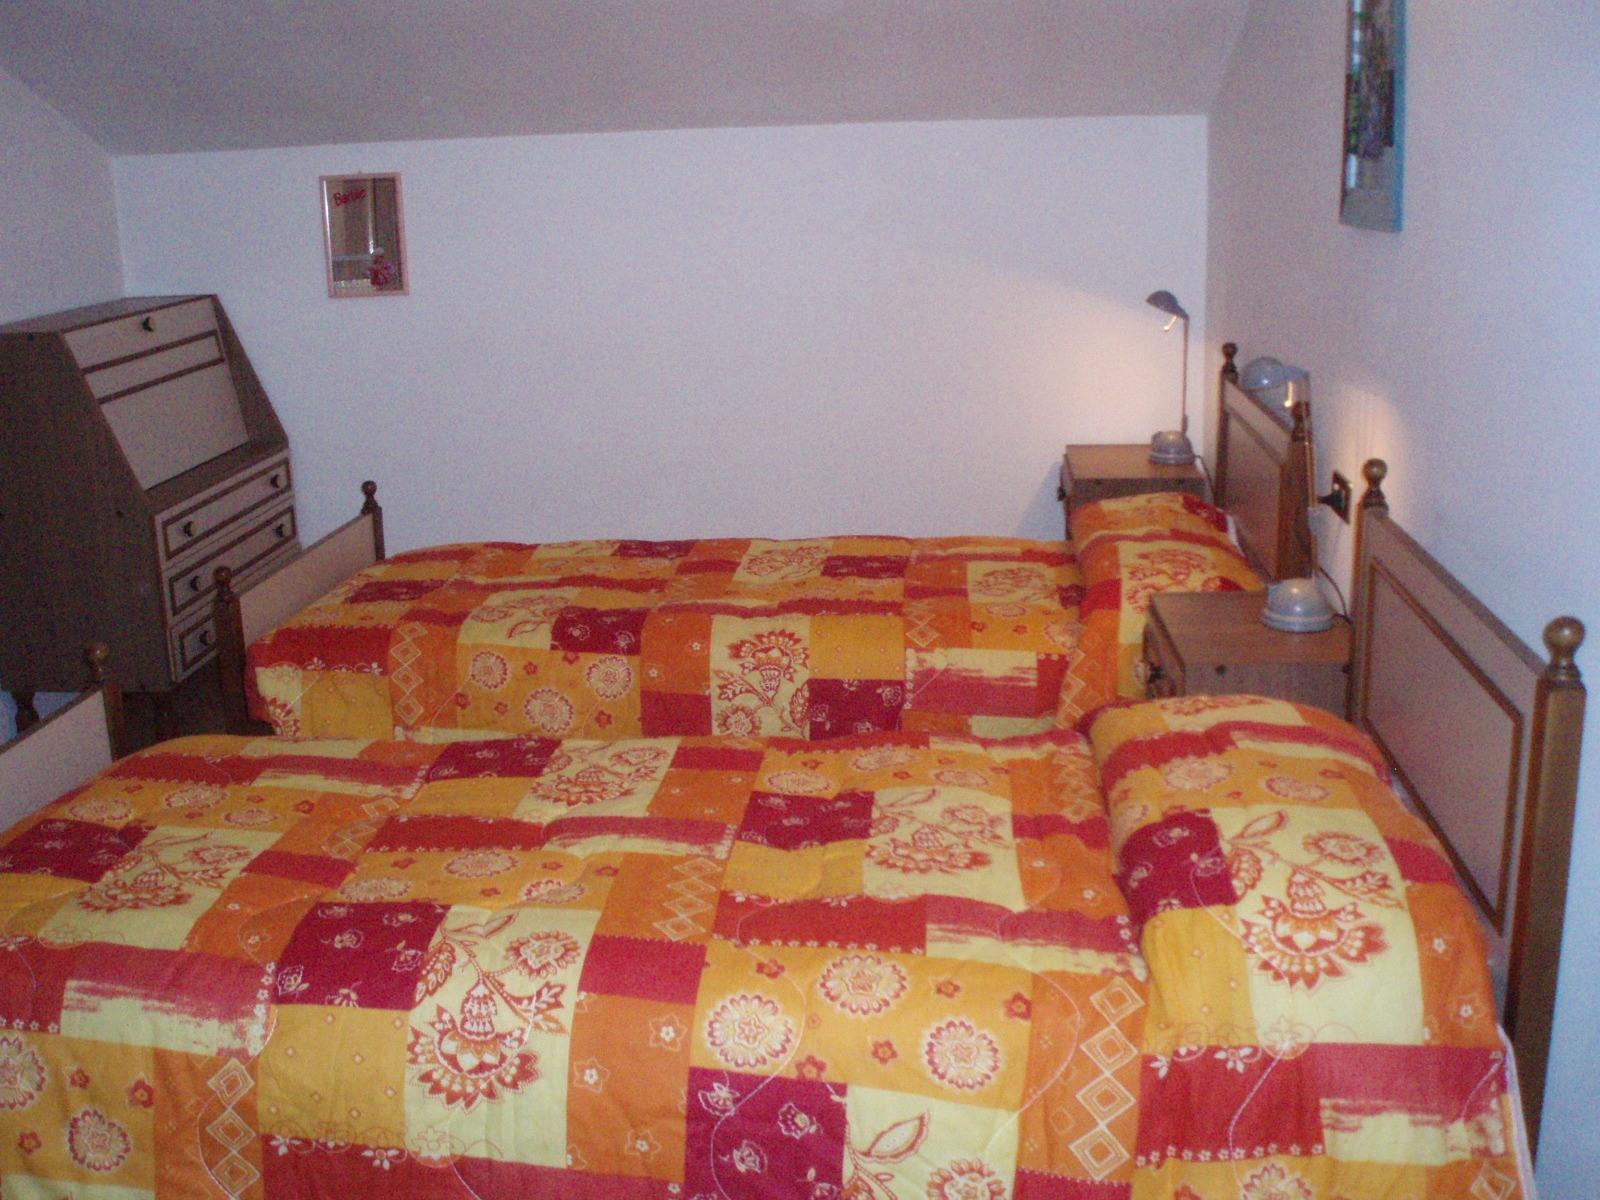 affitto appartamento montagna varenna 1410 (1410_2009415214017.JPG)